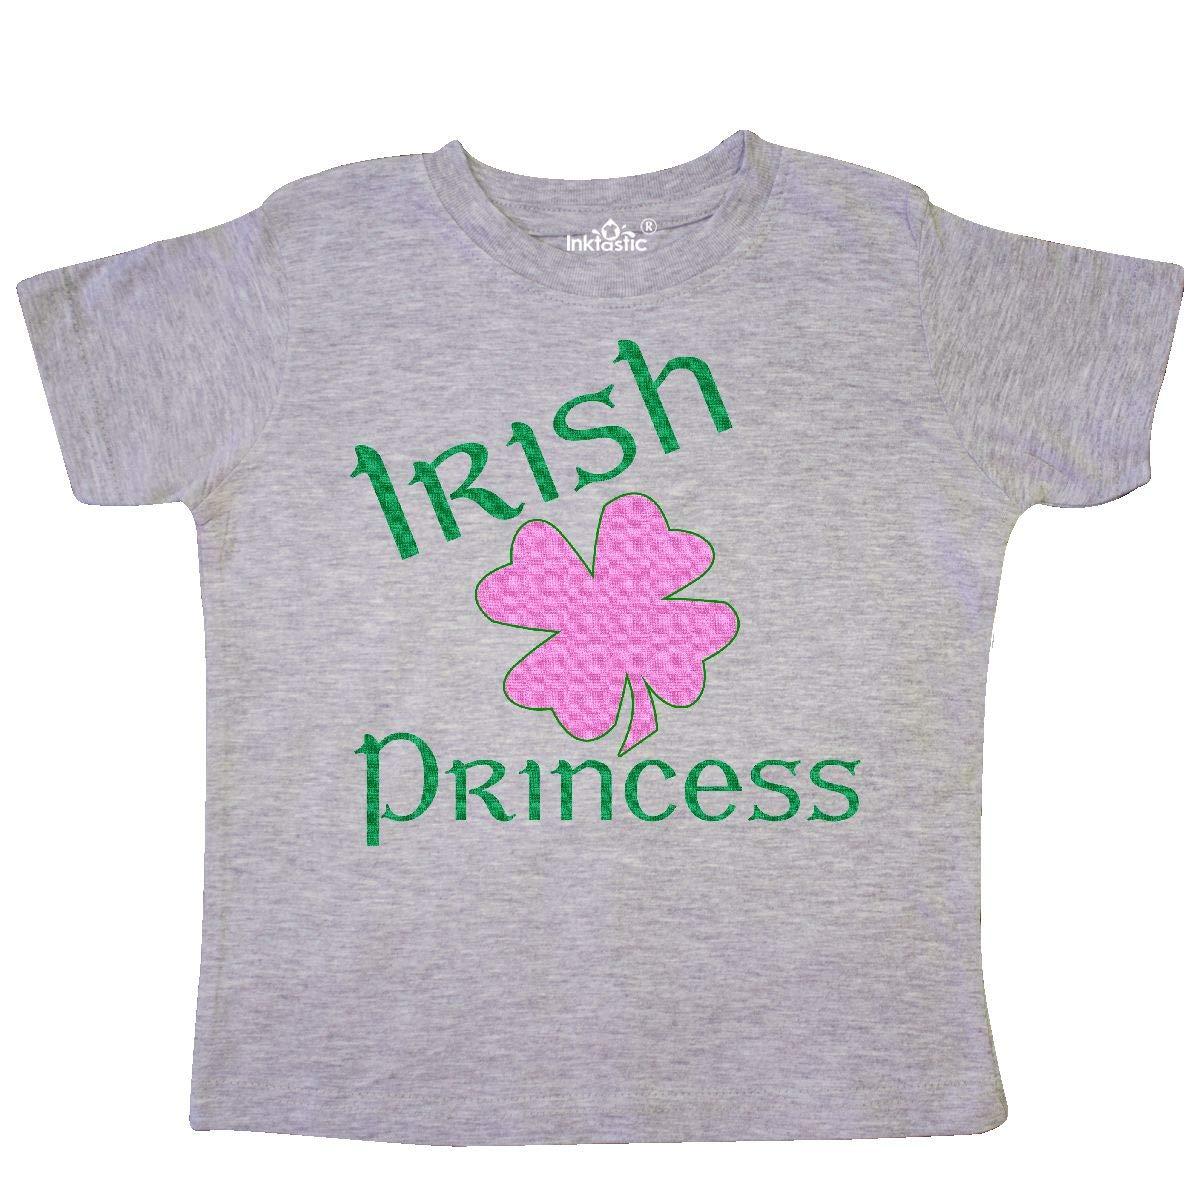 inktastic Irish Princess Toddler T-Shirt